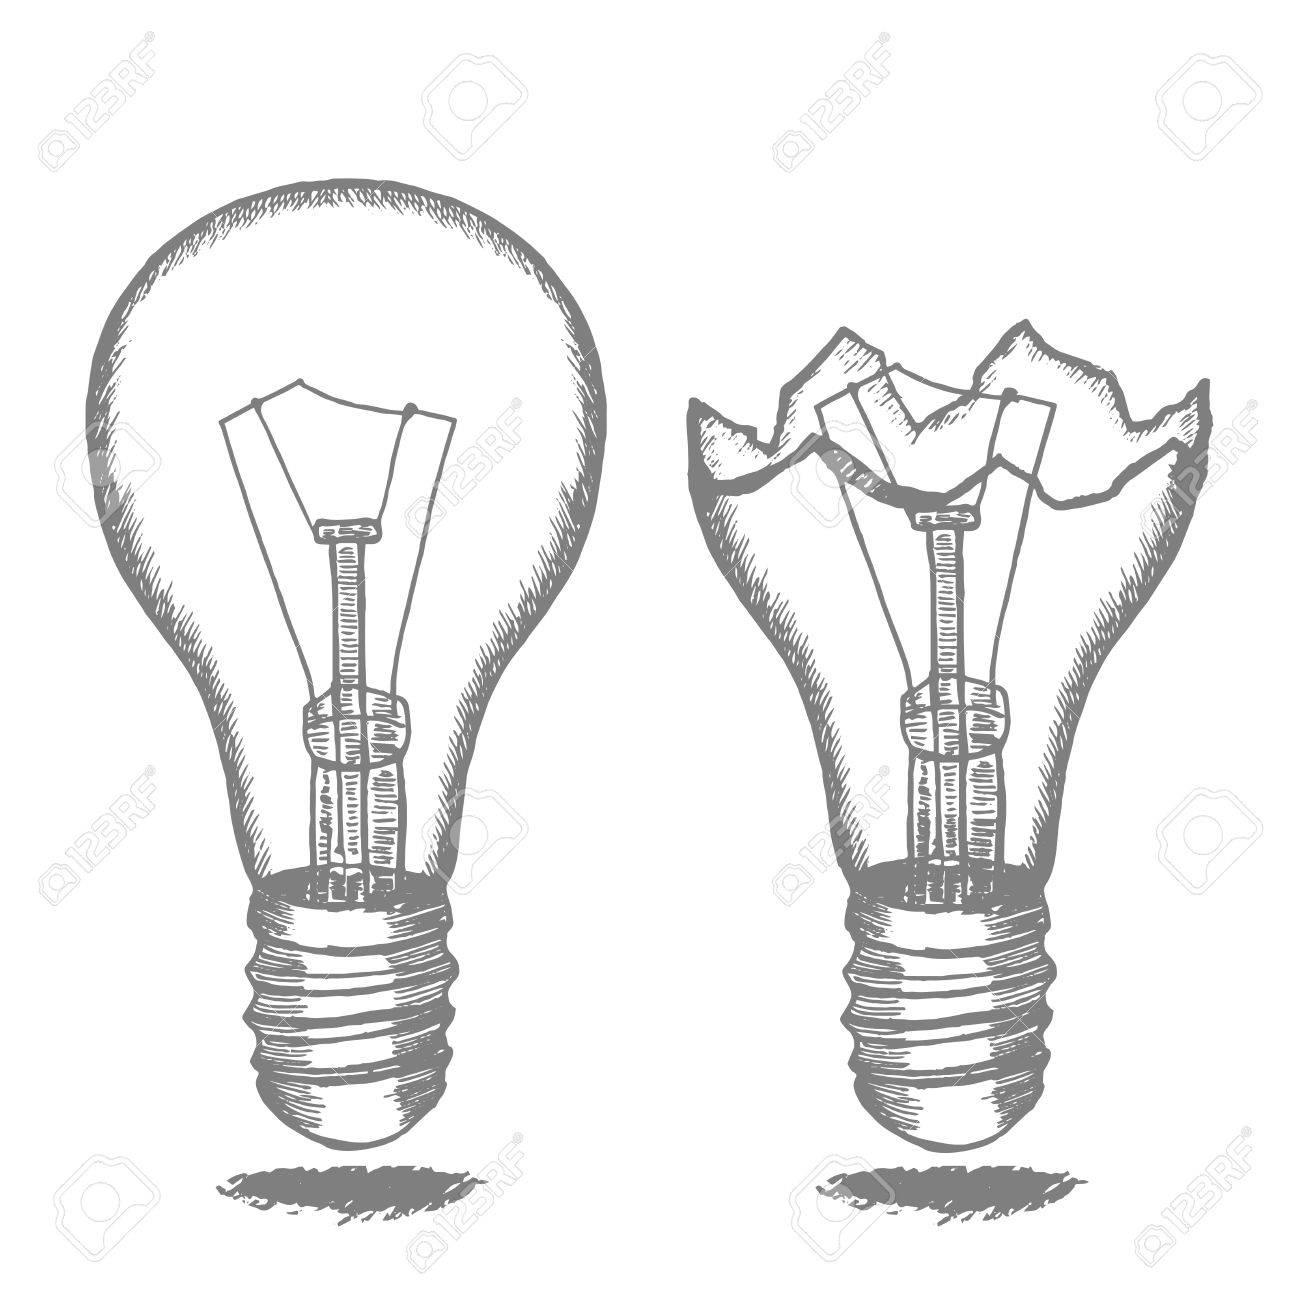 Lamp Bulb Hand Draw Sketch. Vector Stock Vector   69814521